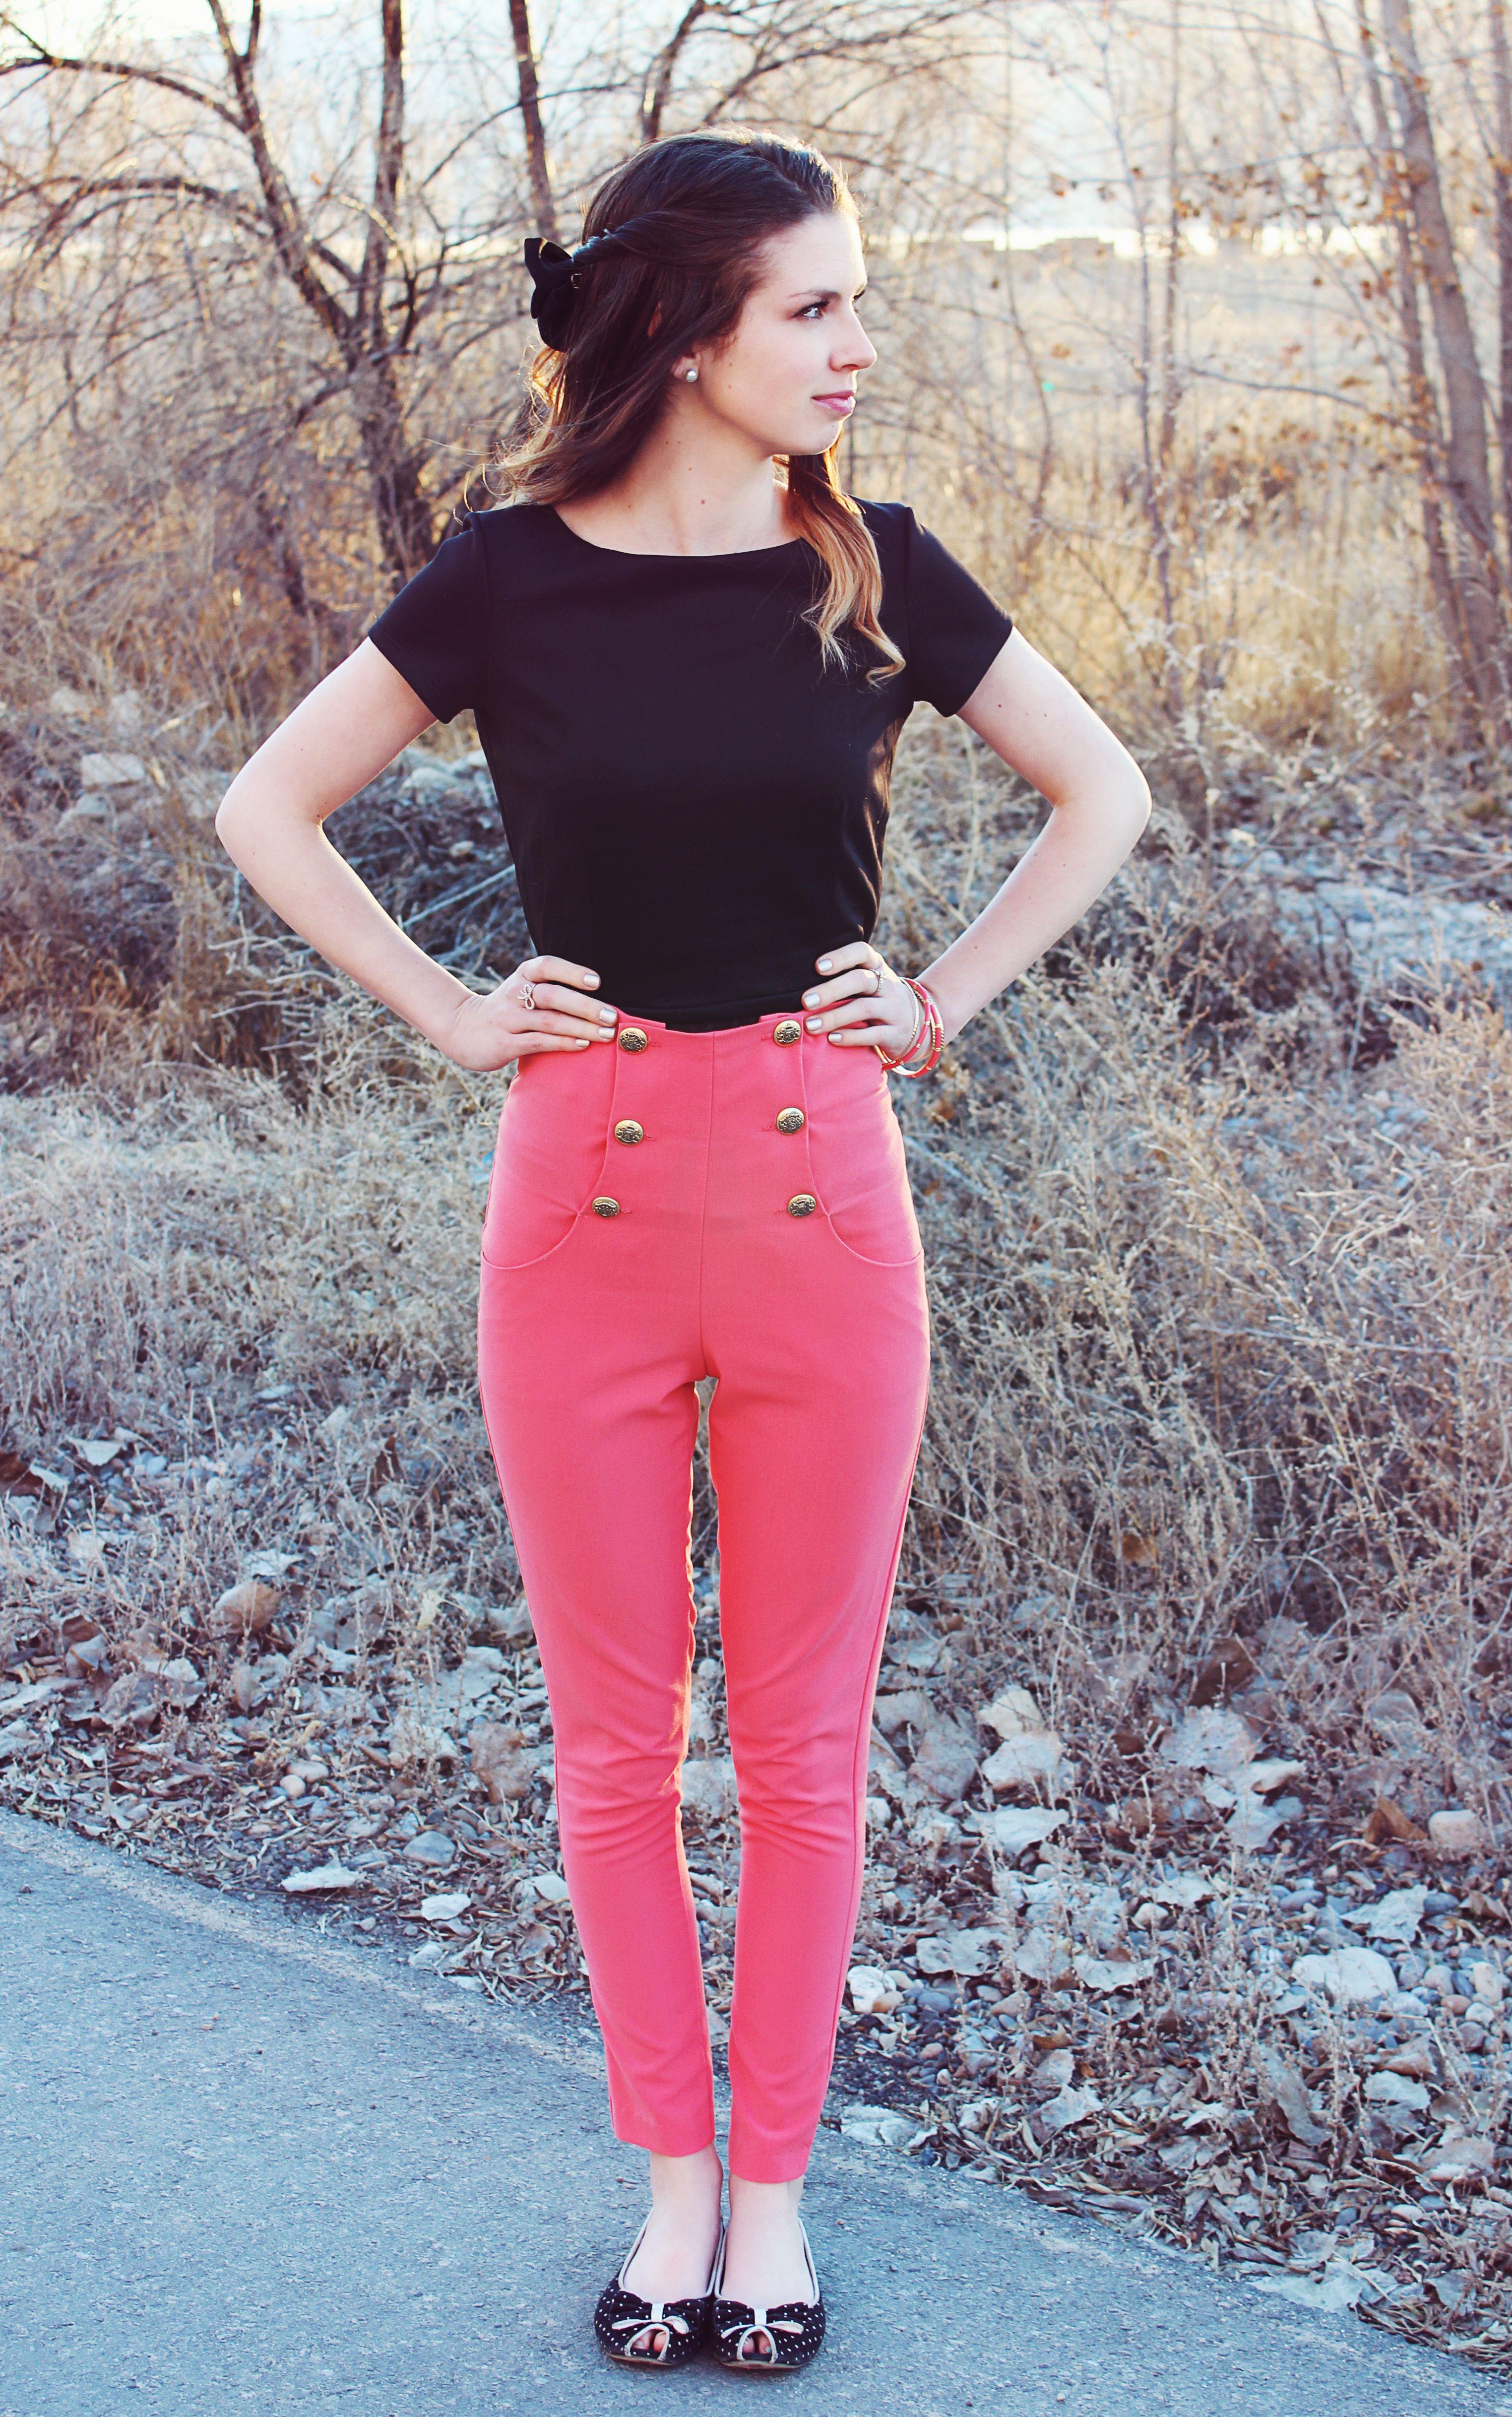 DarlingOnADollar.com #blog #blogger #fashionblog #styleblog #clothes #fashion #style #vintage #pink #highwaisted